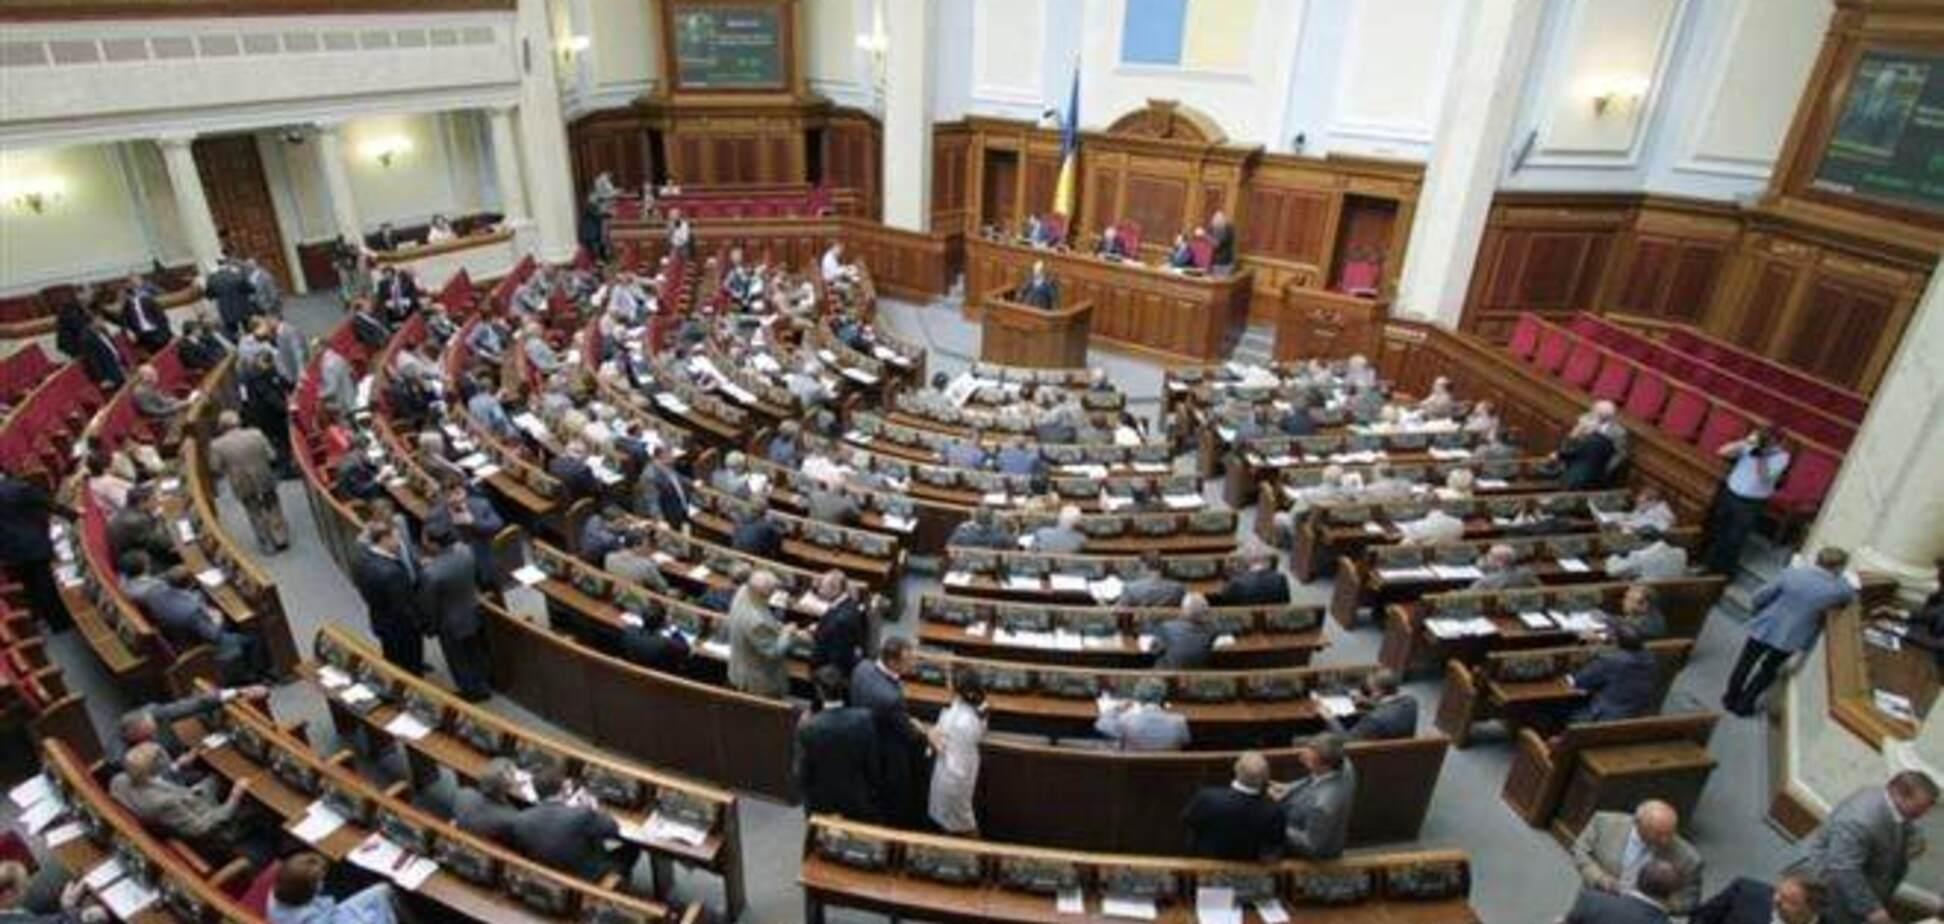 У четвер Рада розгляне проект Держбюджету на 2014 рік